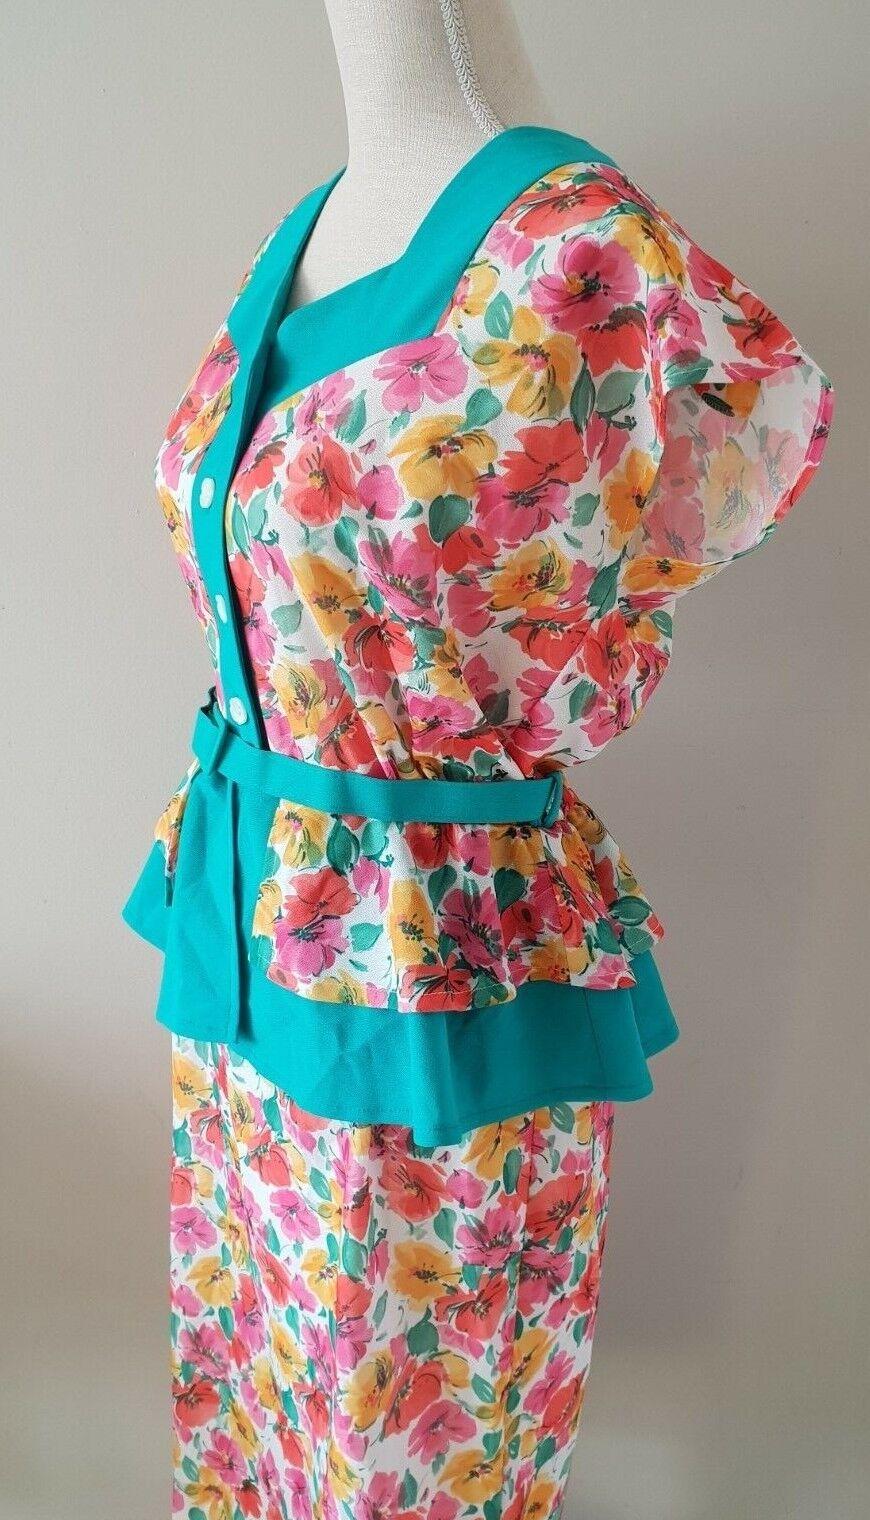 Vintage Dress Colourful Floral Dress in Vintage Style